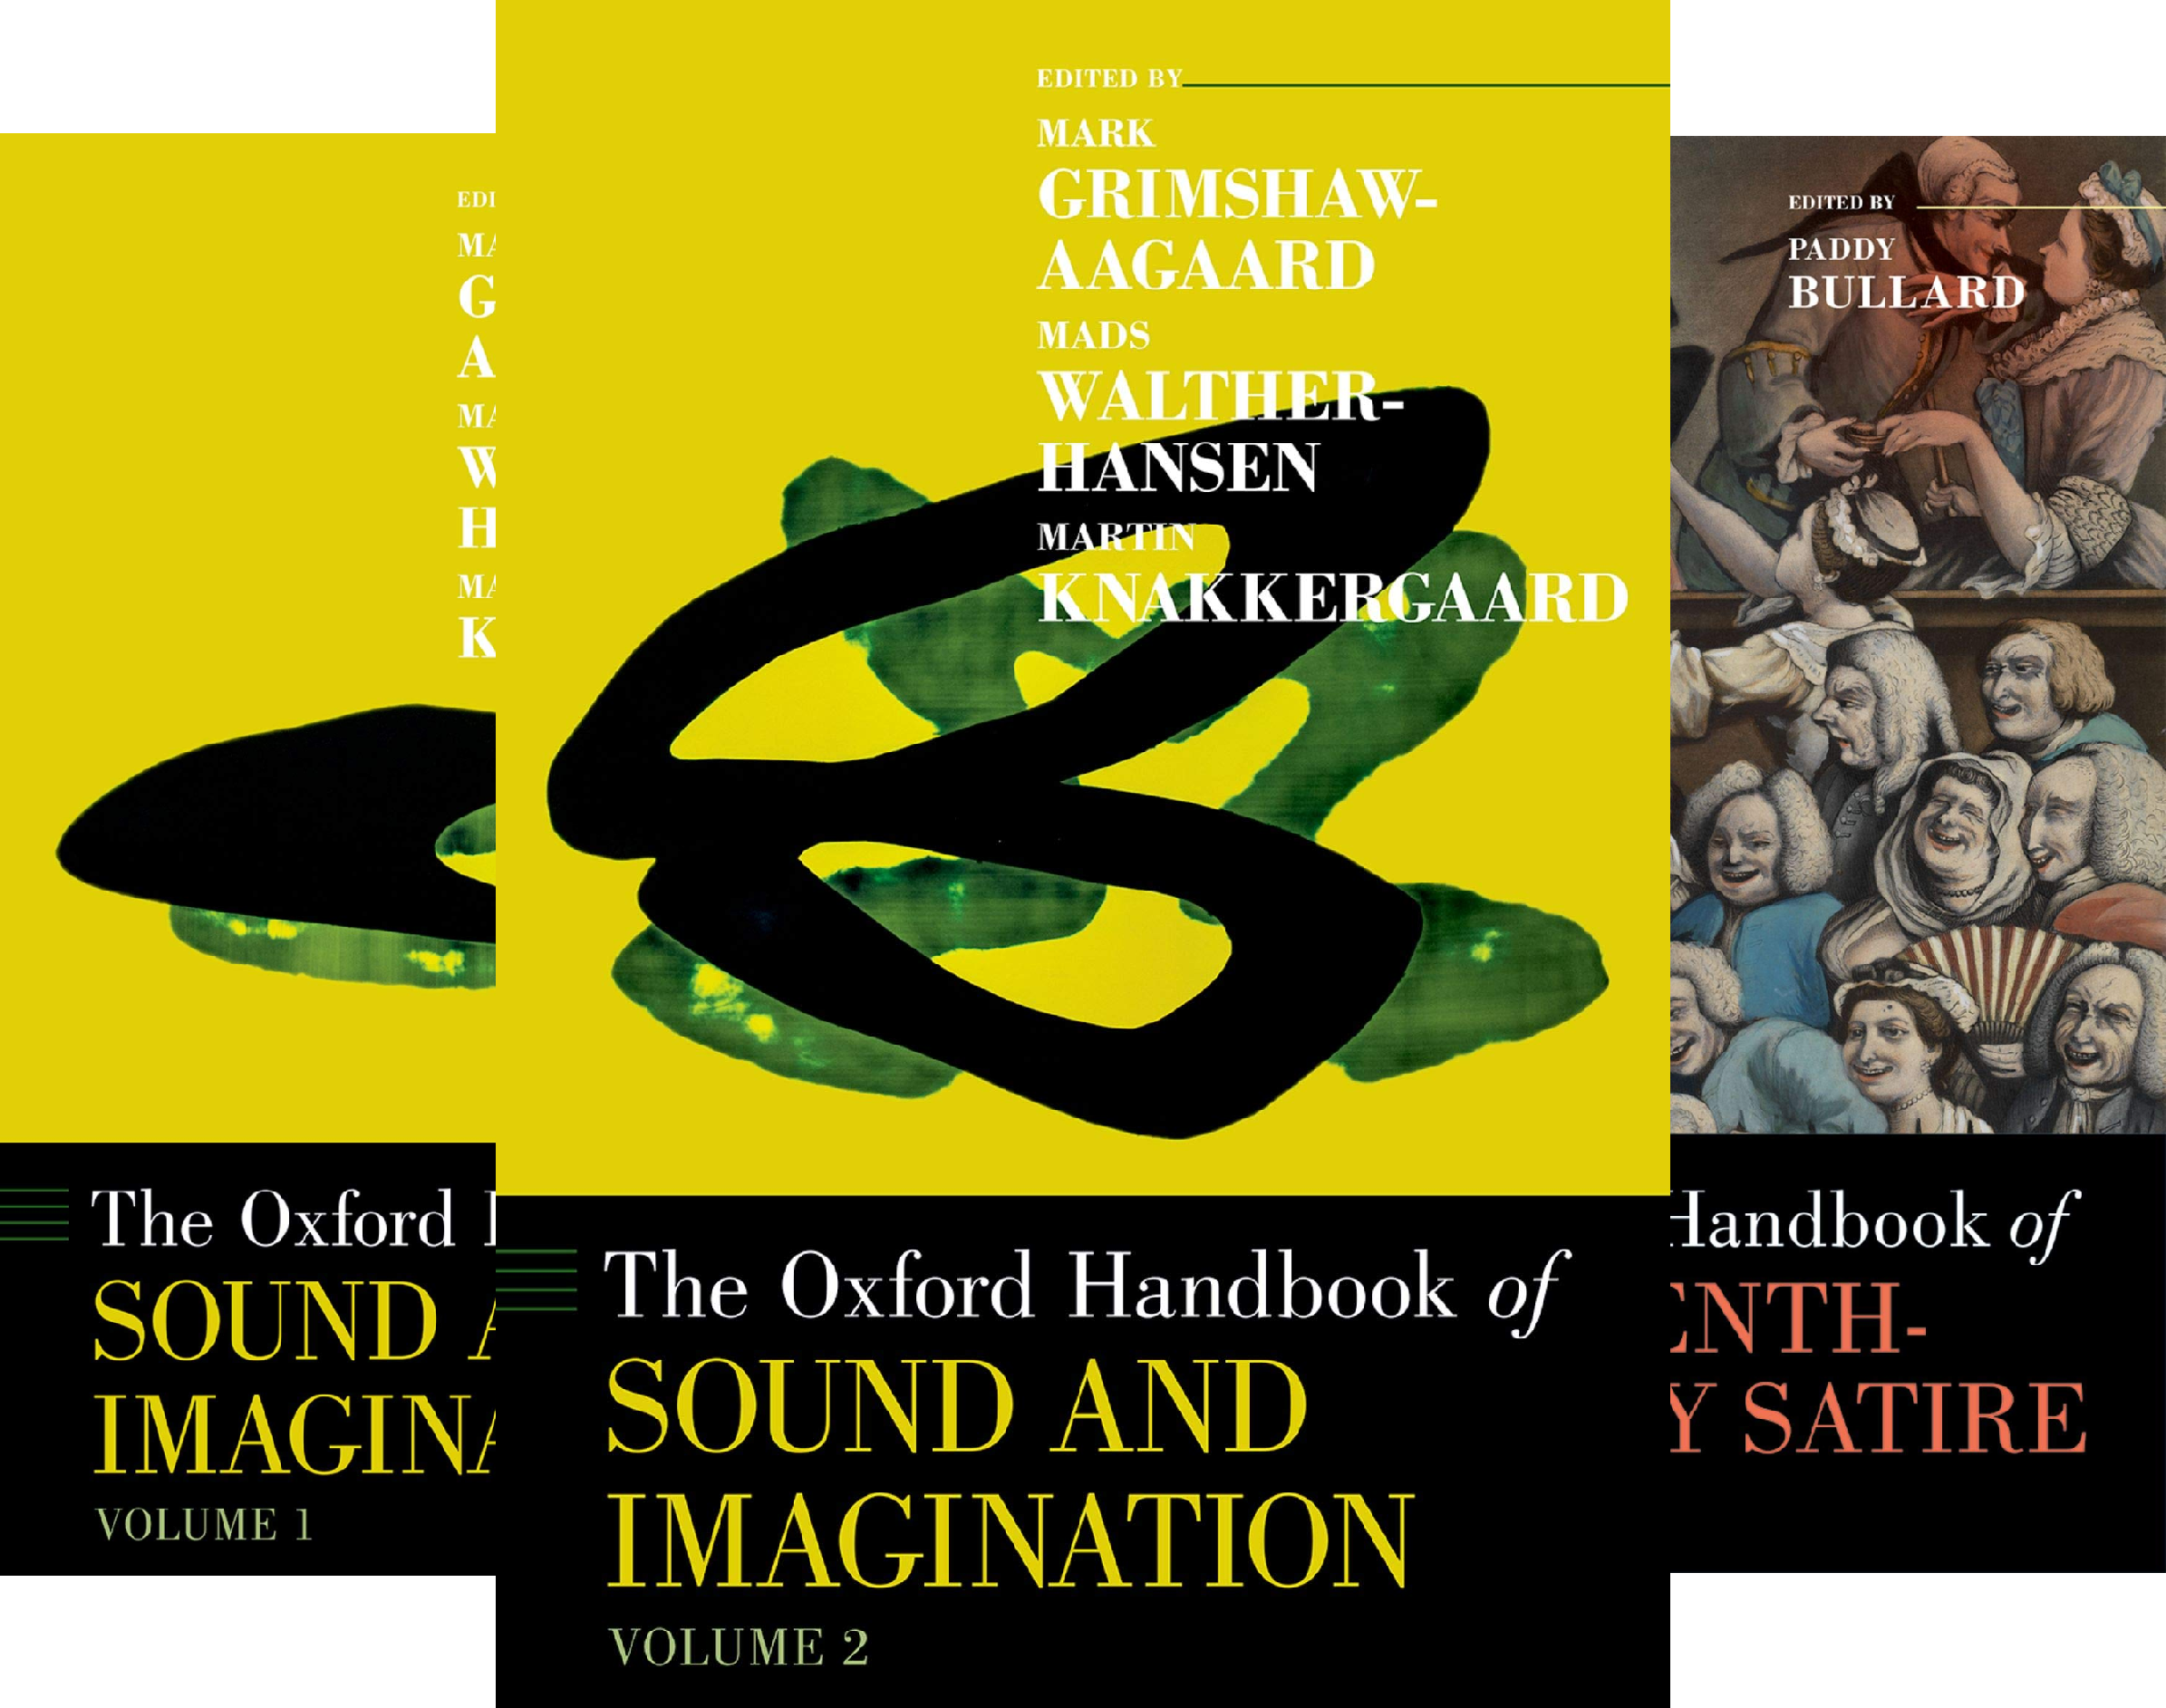 Oxford Handbooks